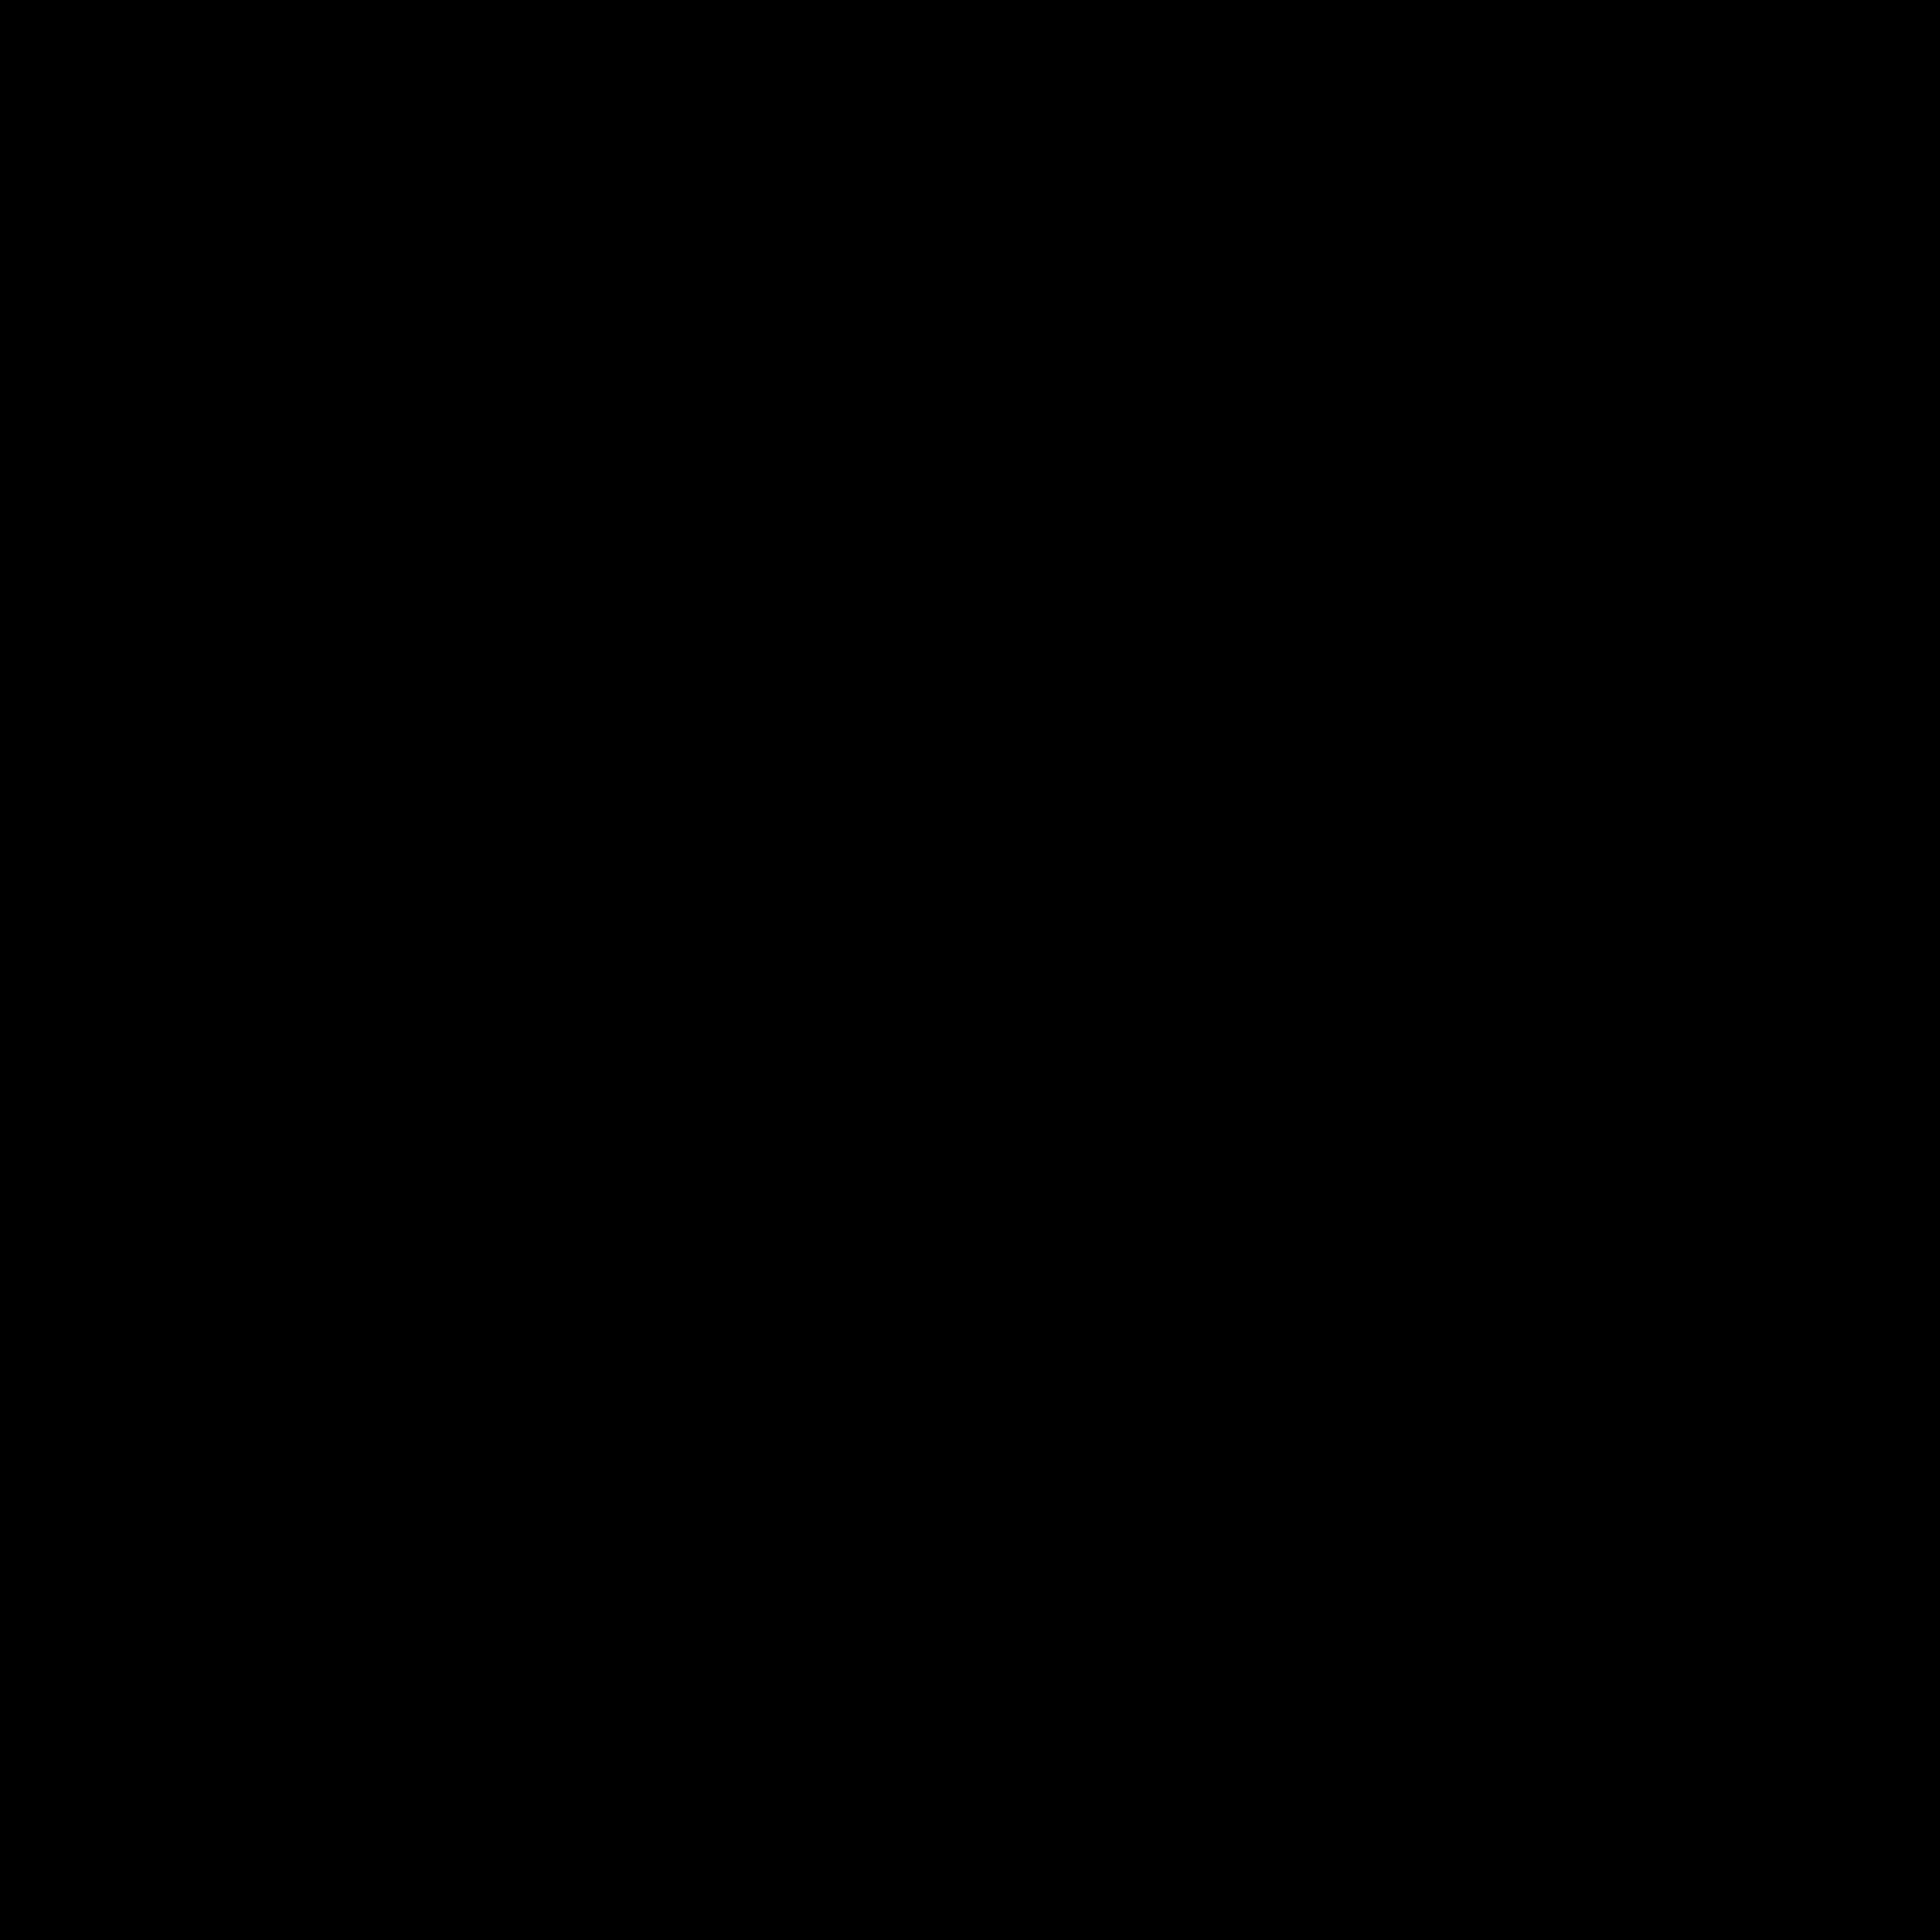 zara logo 0 - Zara Logo